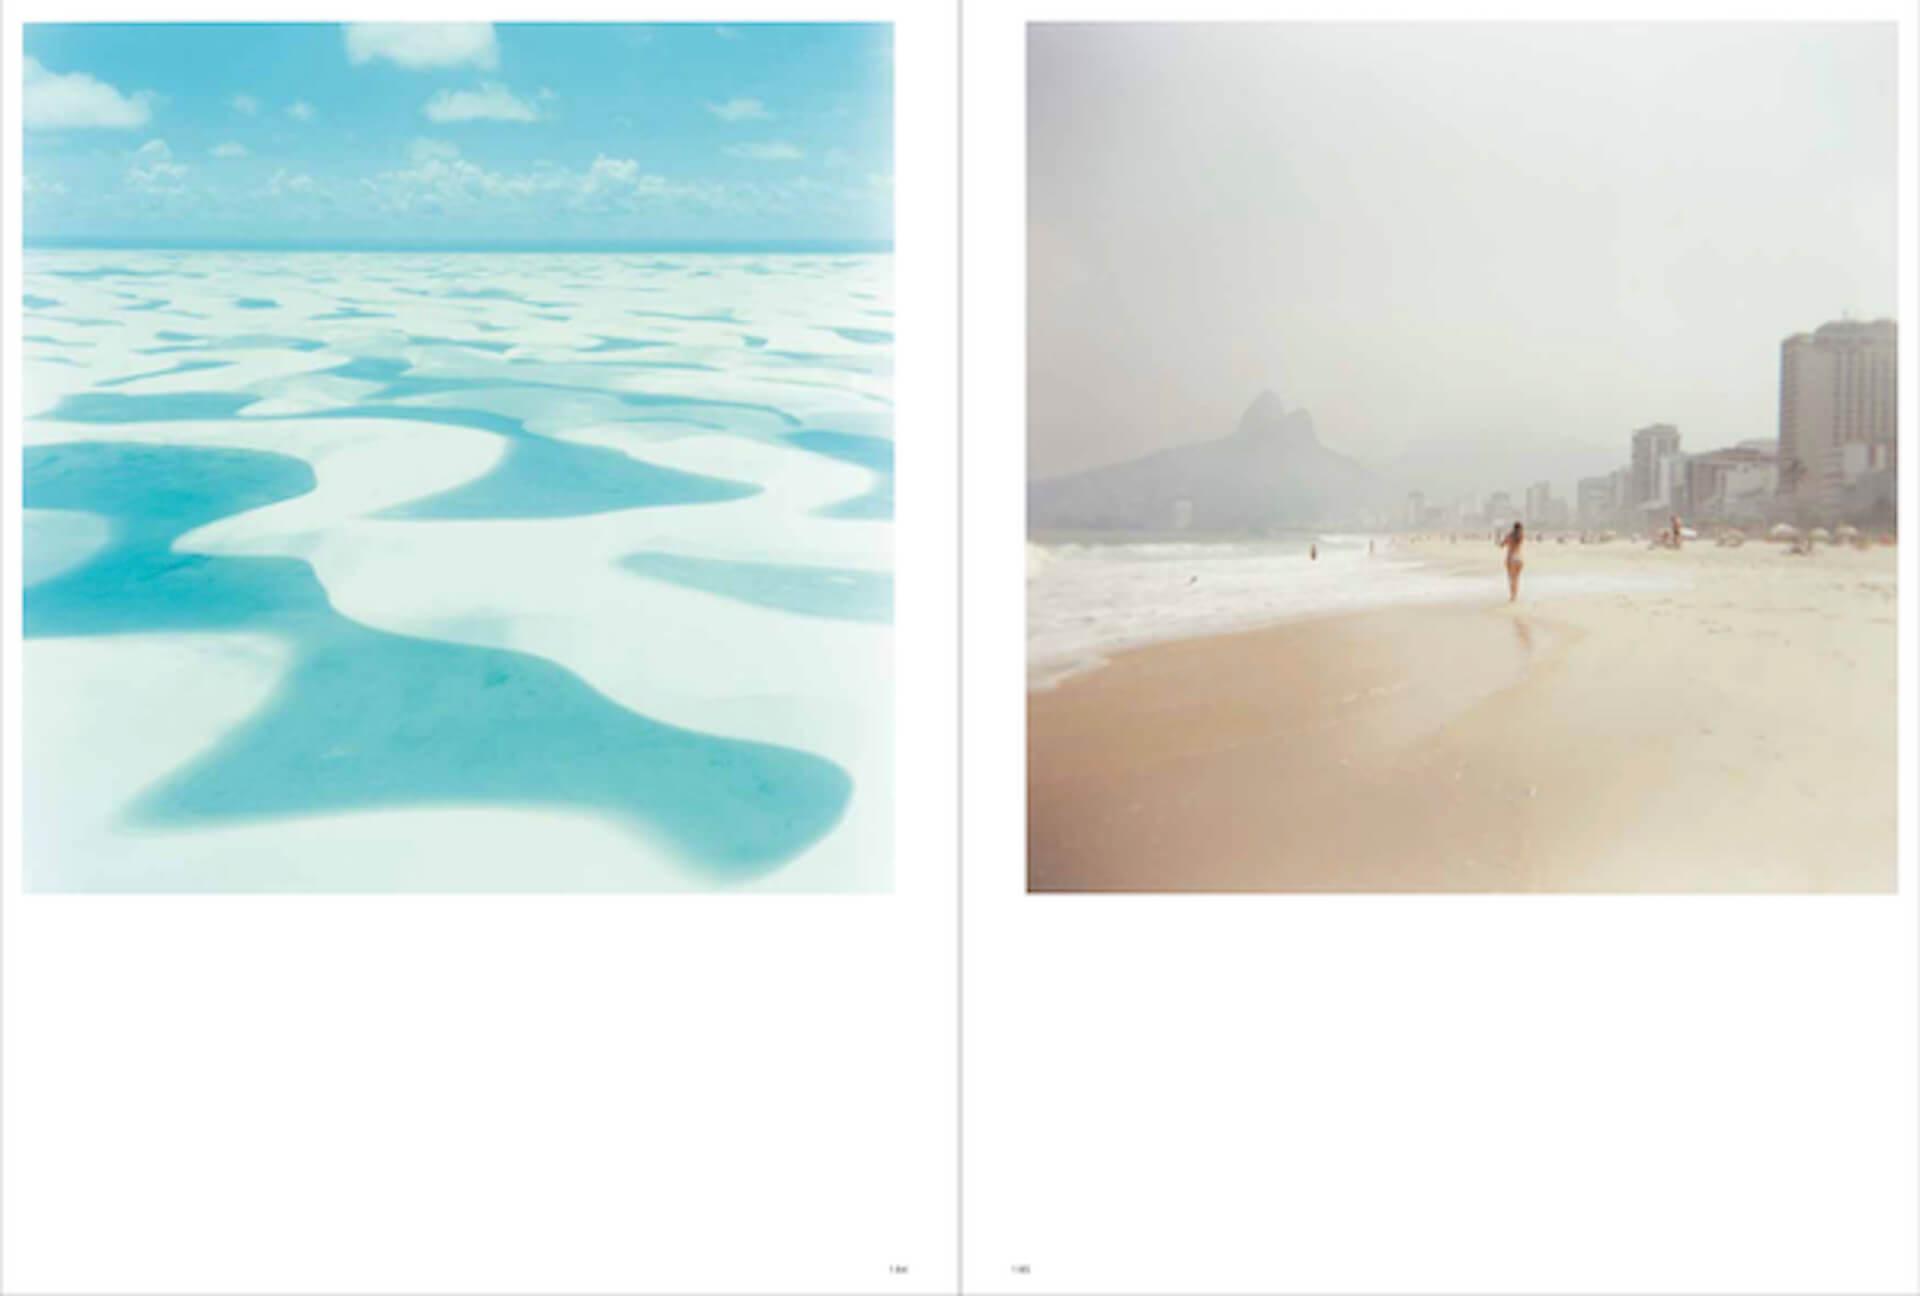 『TRANSIT』の10年超の歩みが2冊の写真集に!企画展<光の記憶- Through our habitat>も開催 art191029_transit_5